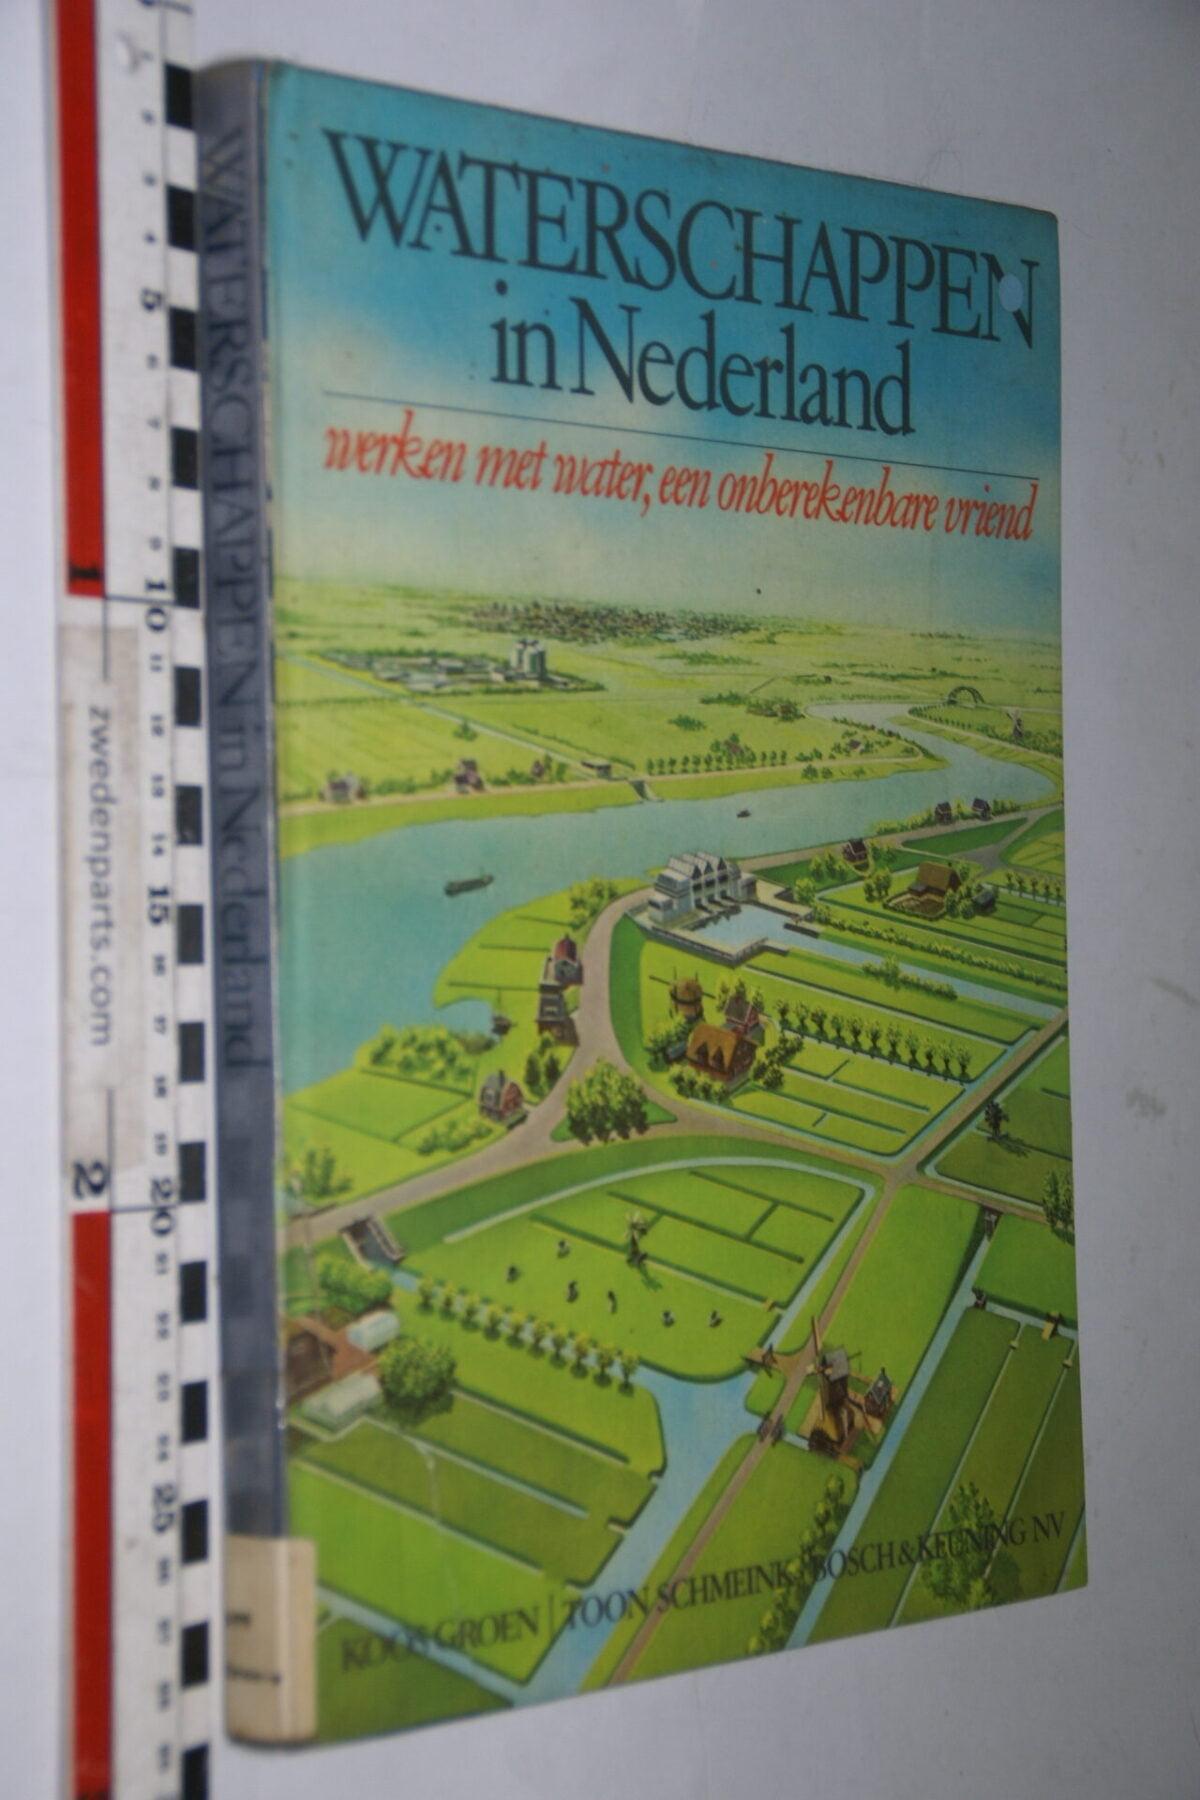 DSC03686 boek Waterschappen in Nederland, ISBN 9024643864-6b0a9f12